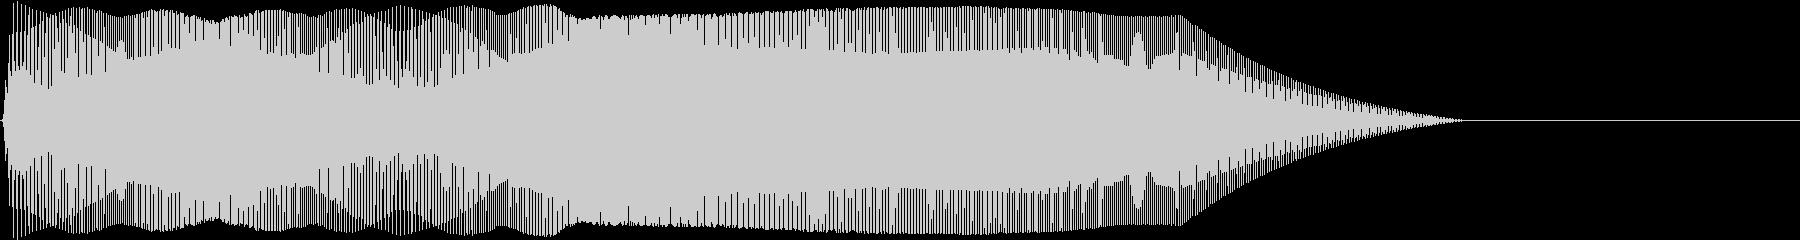 Game 横スクロール系ゲーム 効果音5の未再生の波形